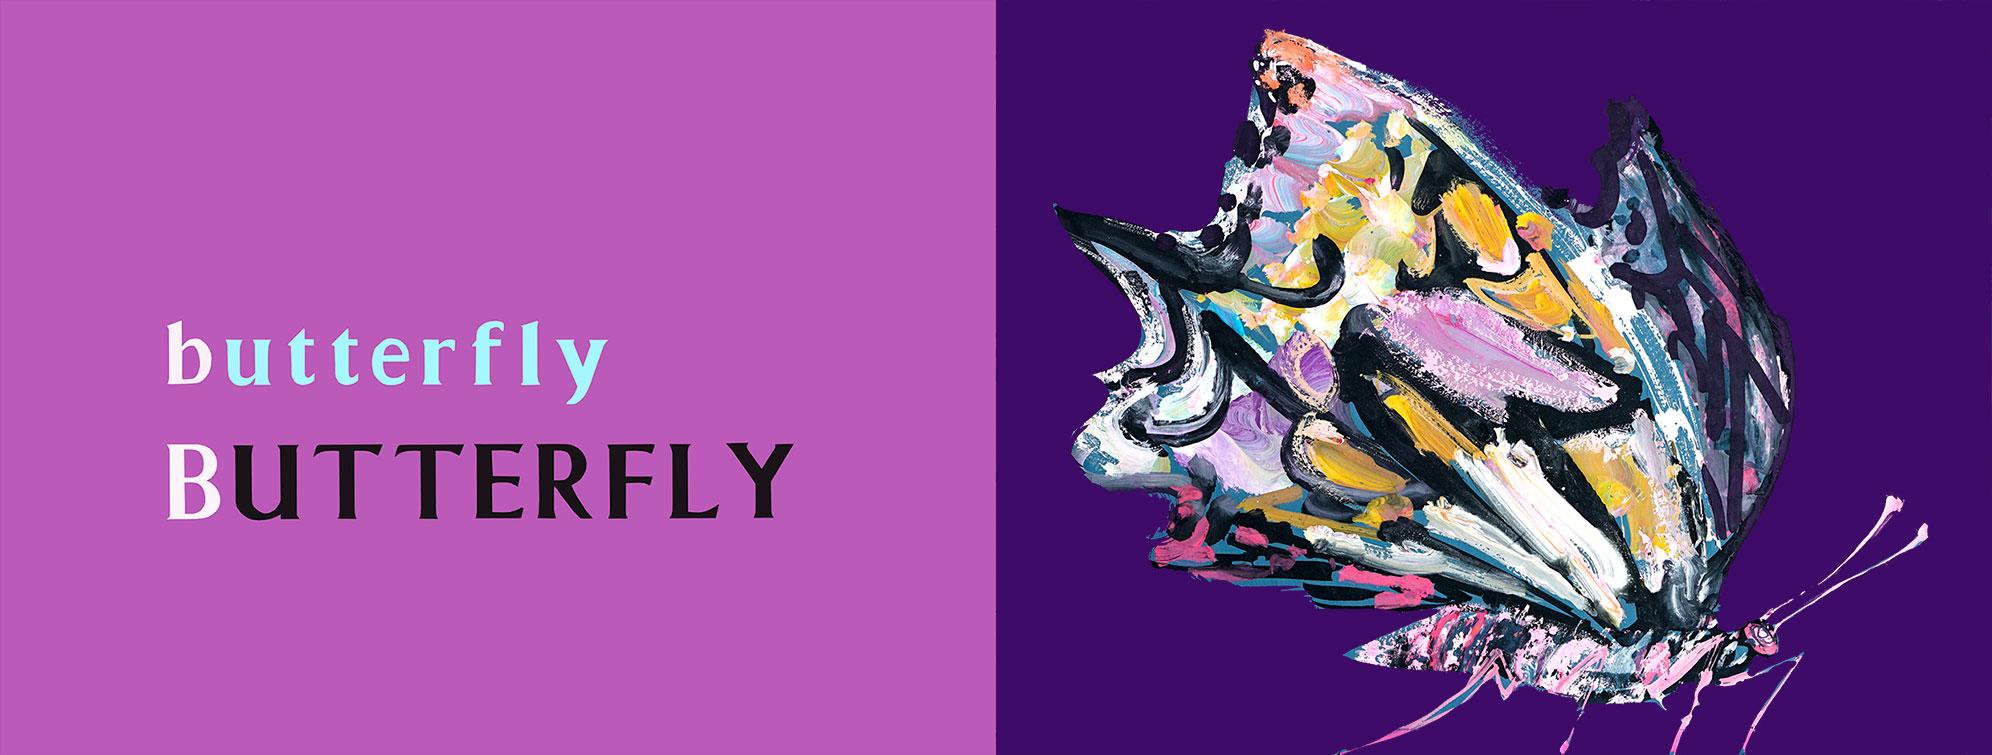 b-for-butterfly-brian-wildsmith-ABC.jpg